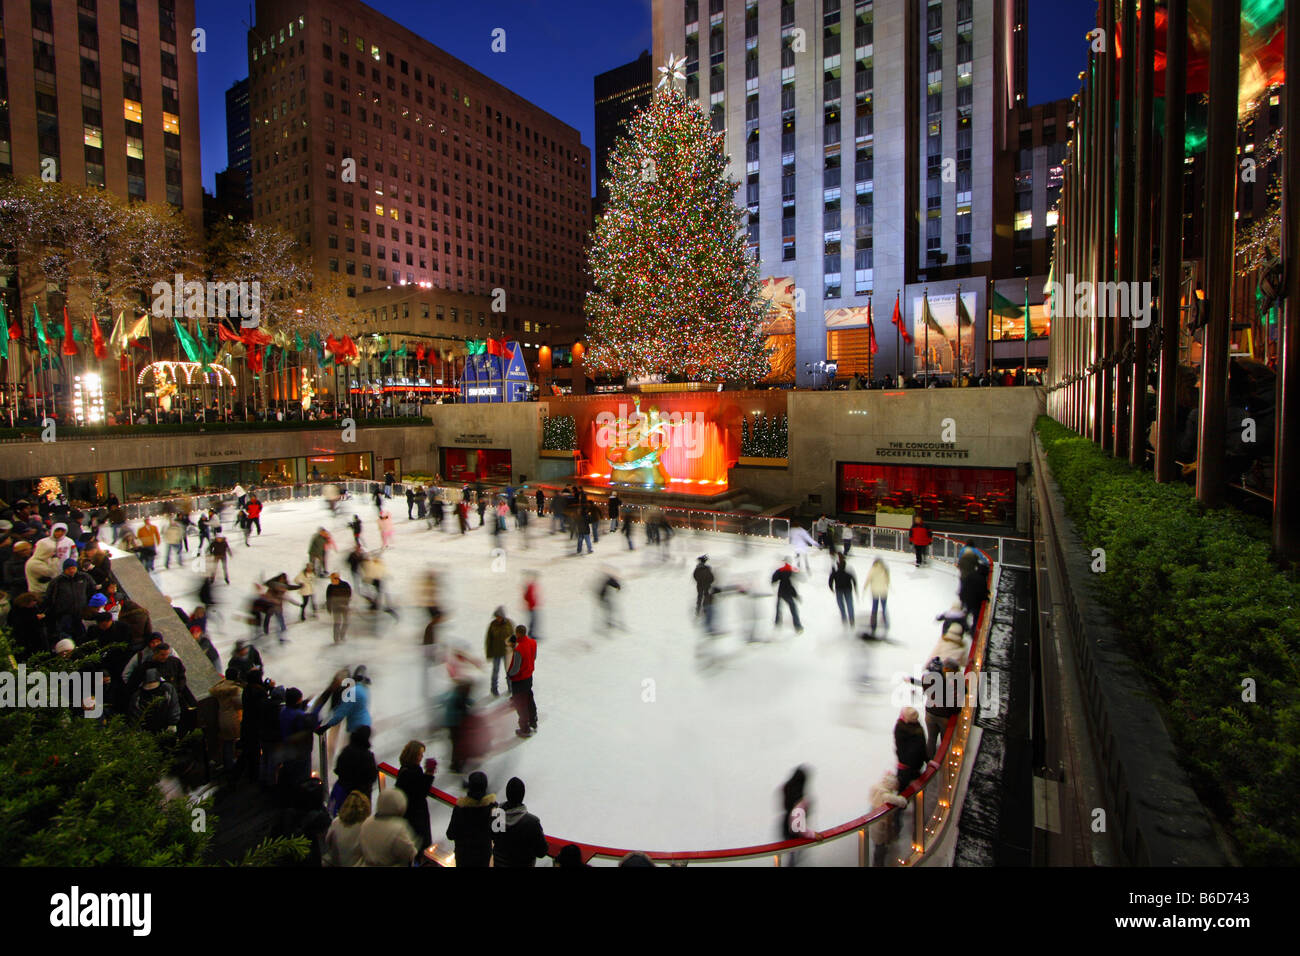 york ice rink